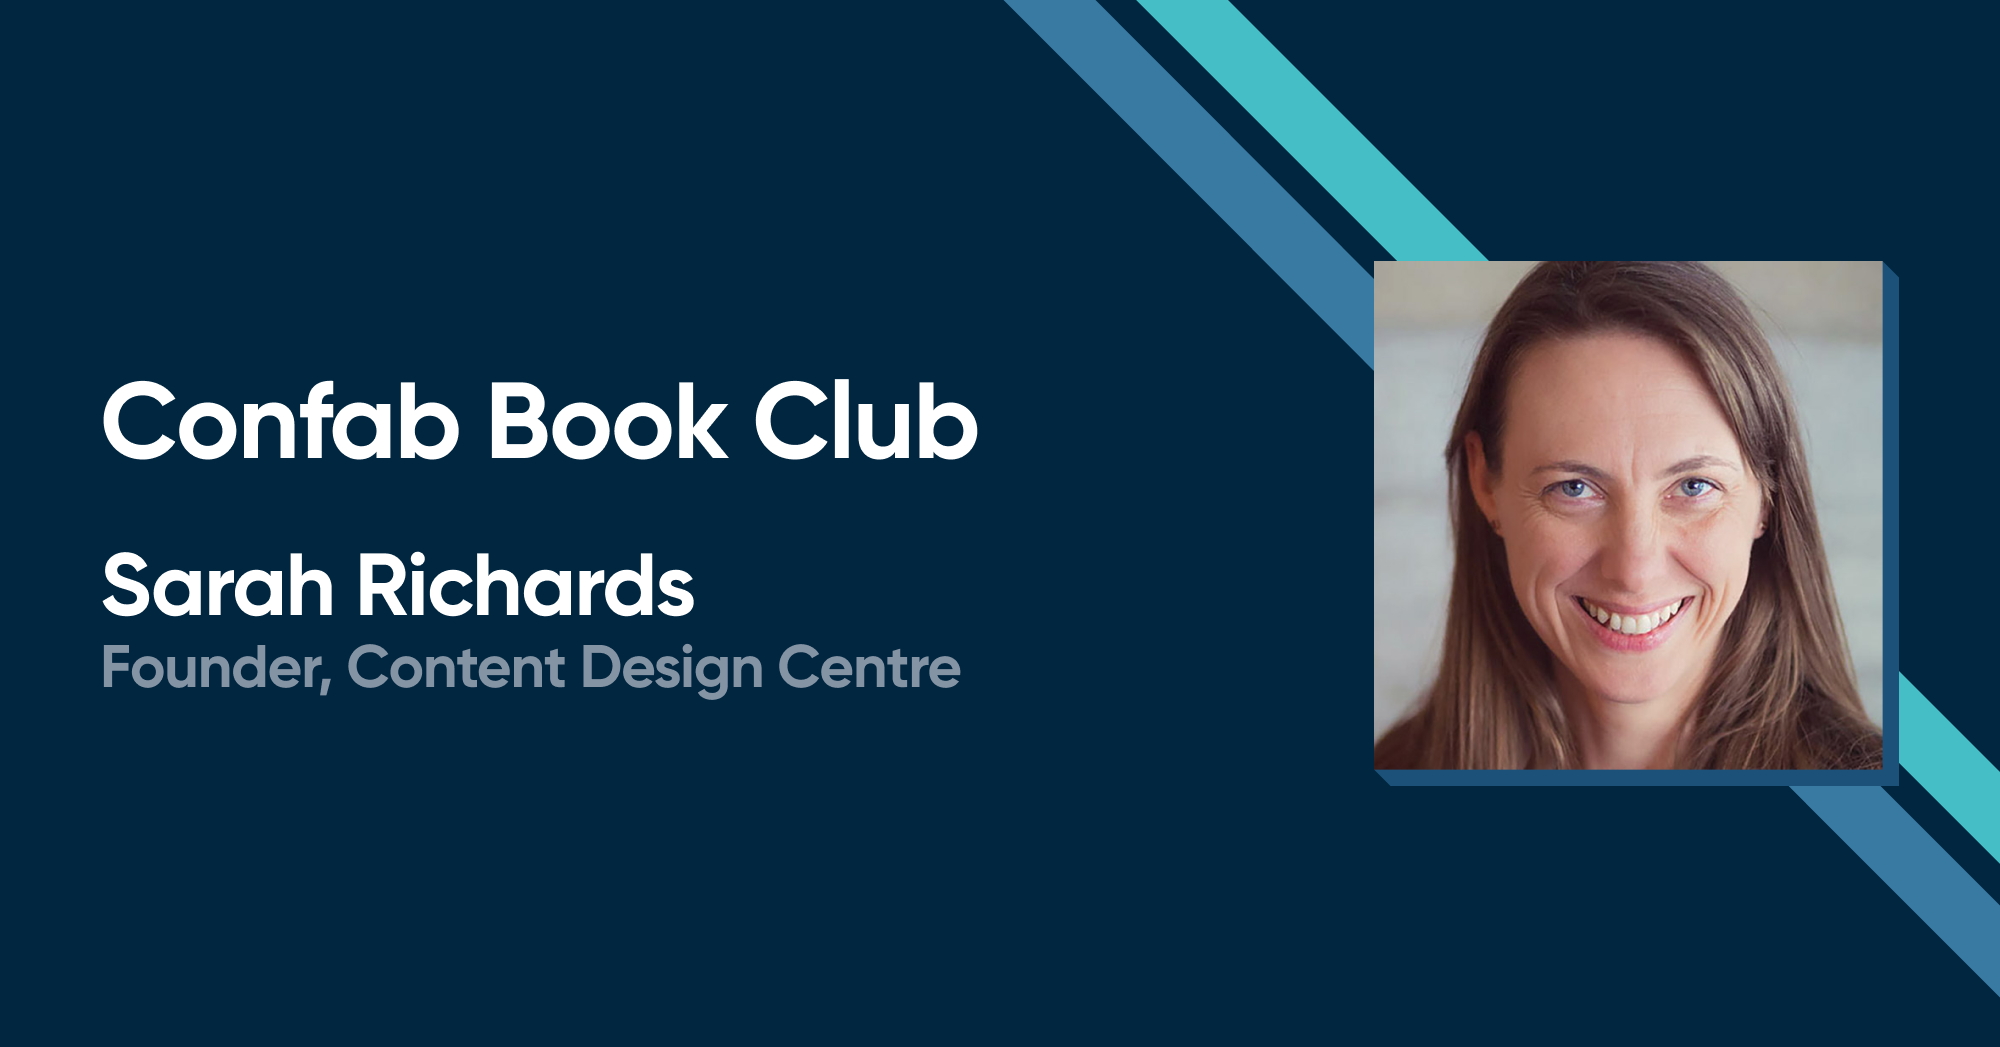 Confab Book Club with Sarah Richards